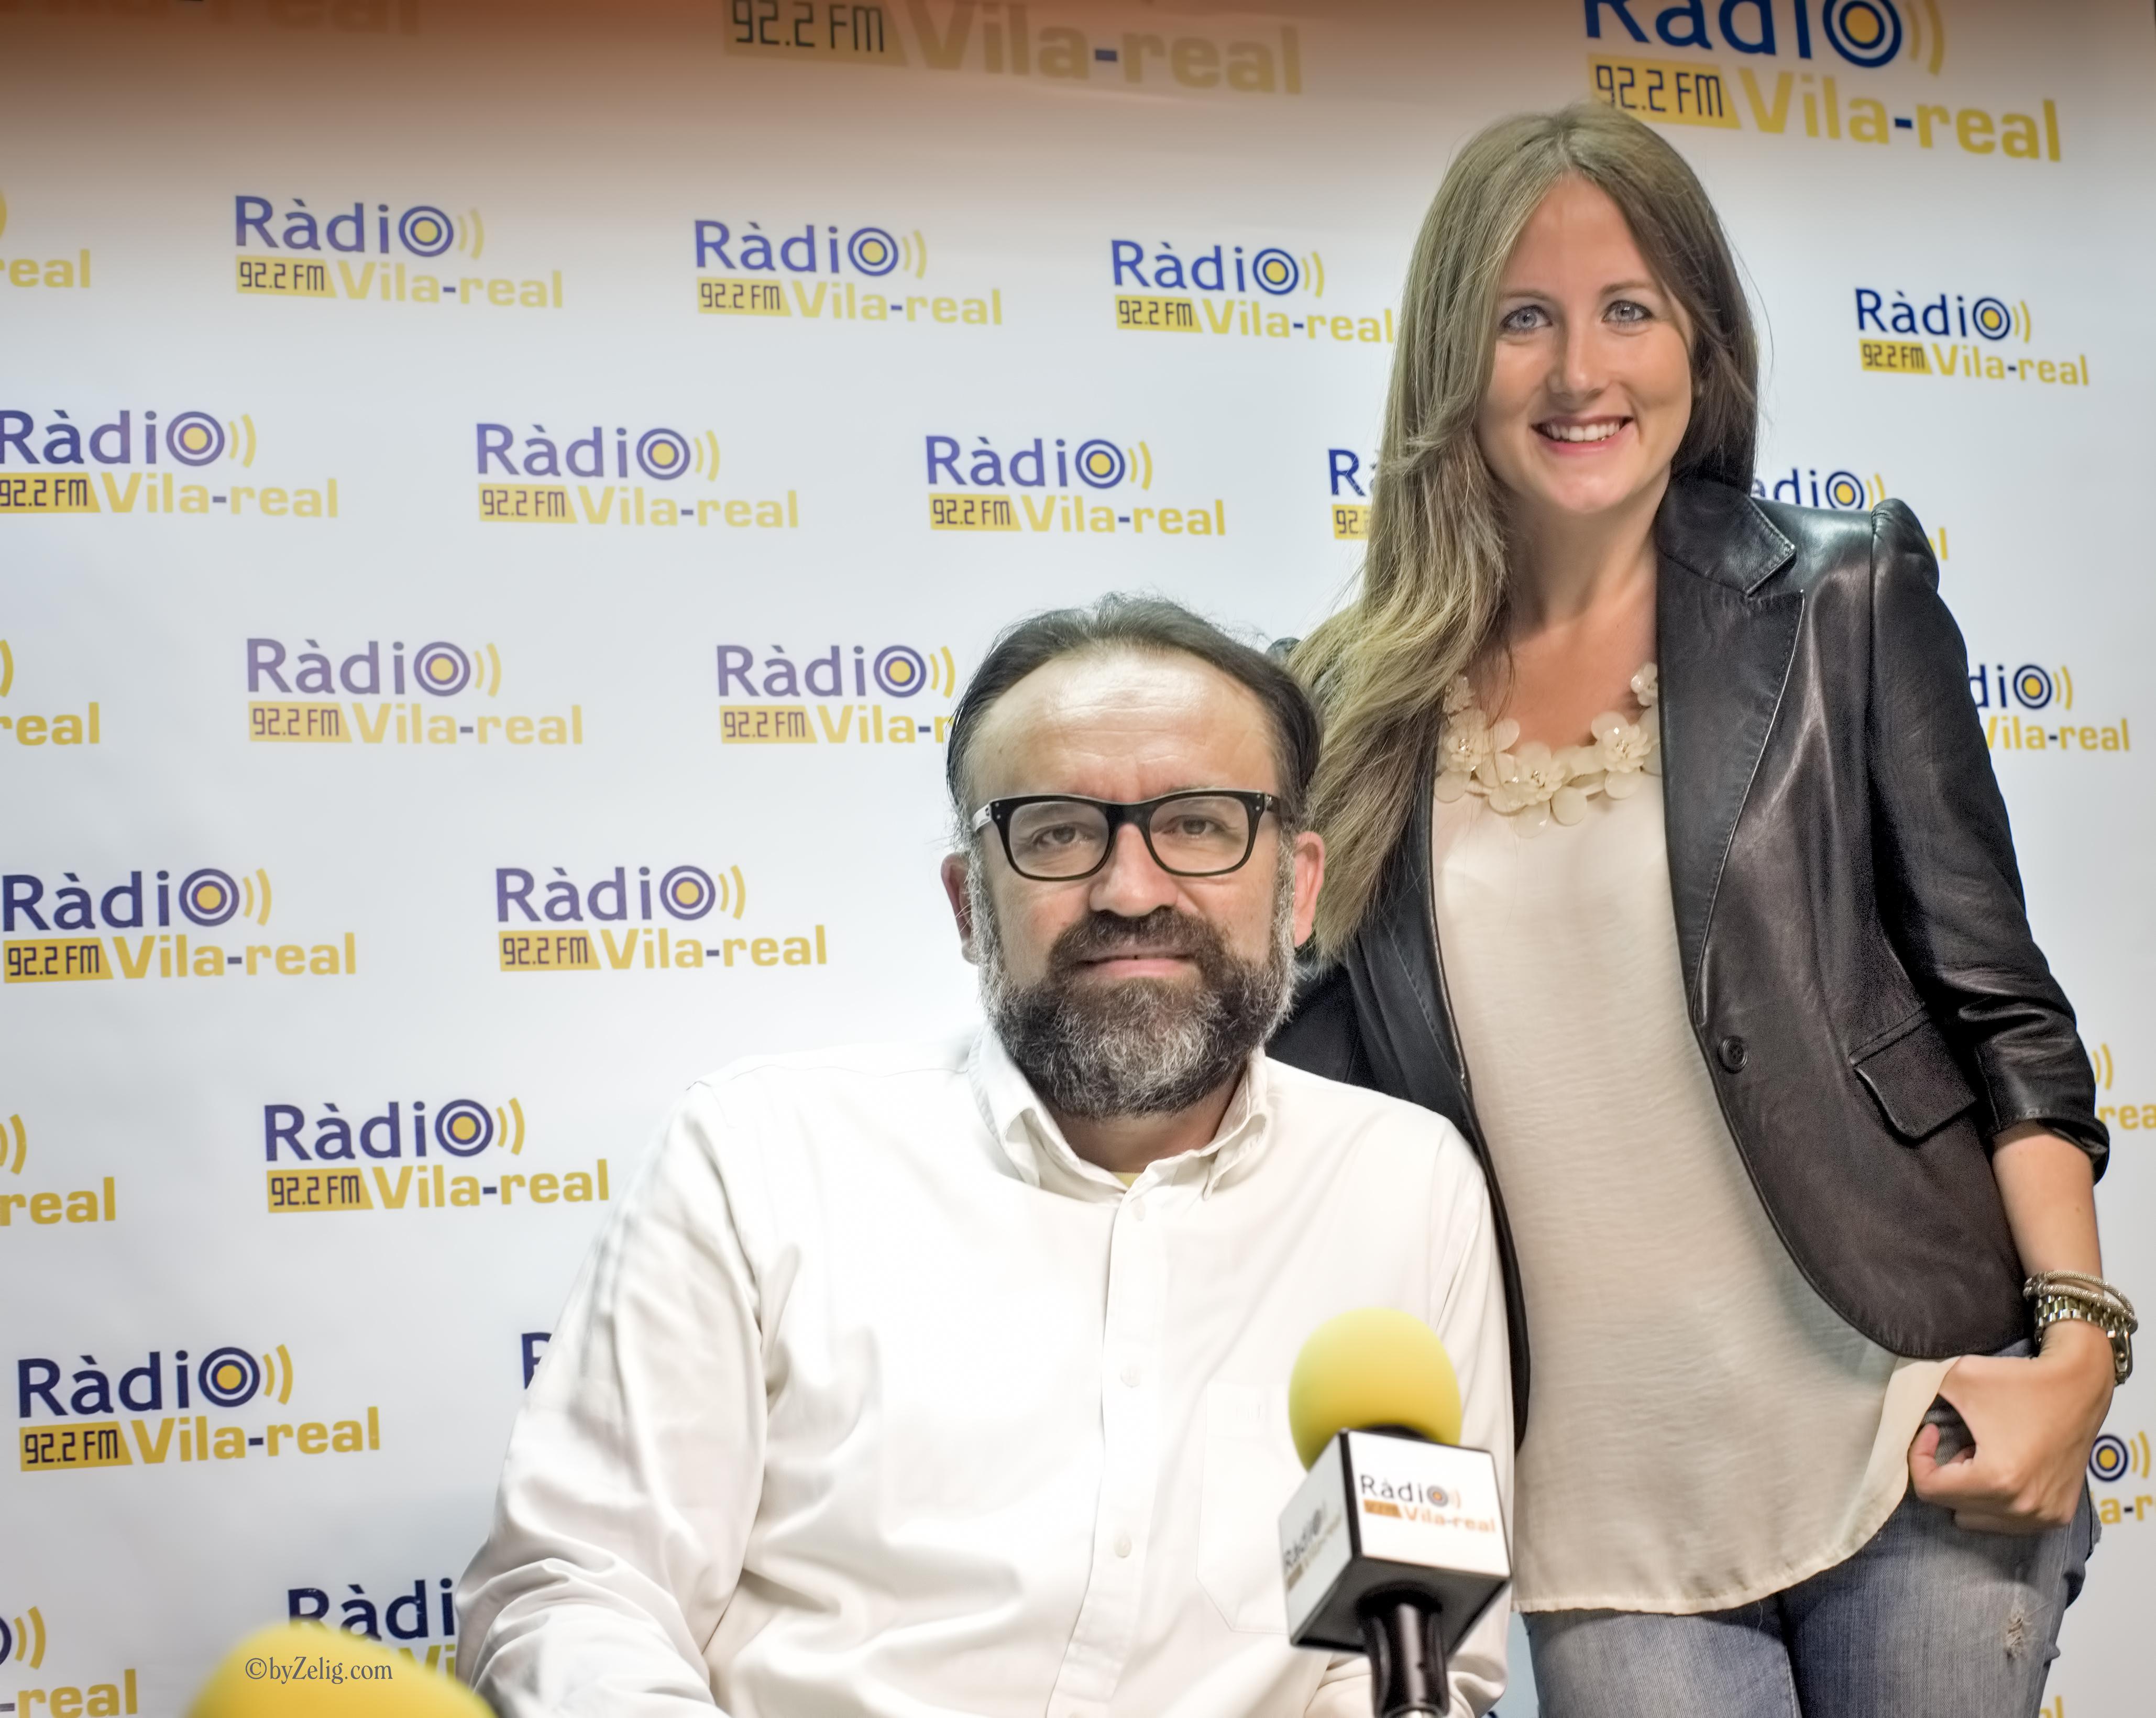 Esports Radio Vila-real. Programa del 15 de febrero de 2017